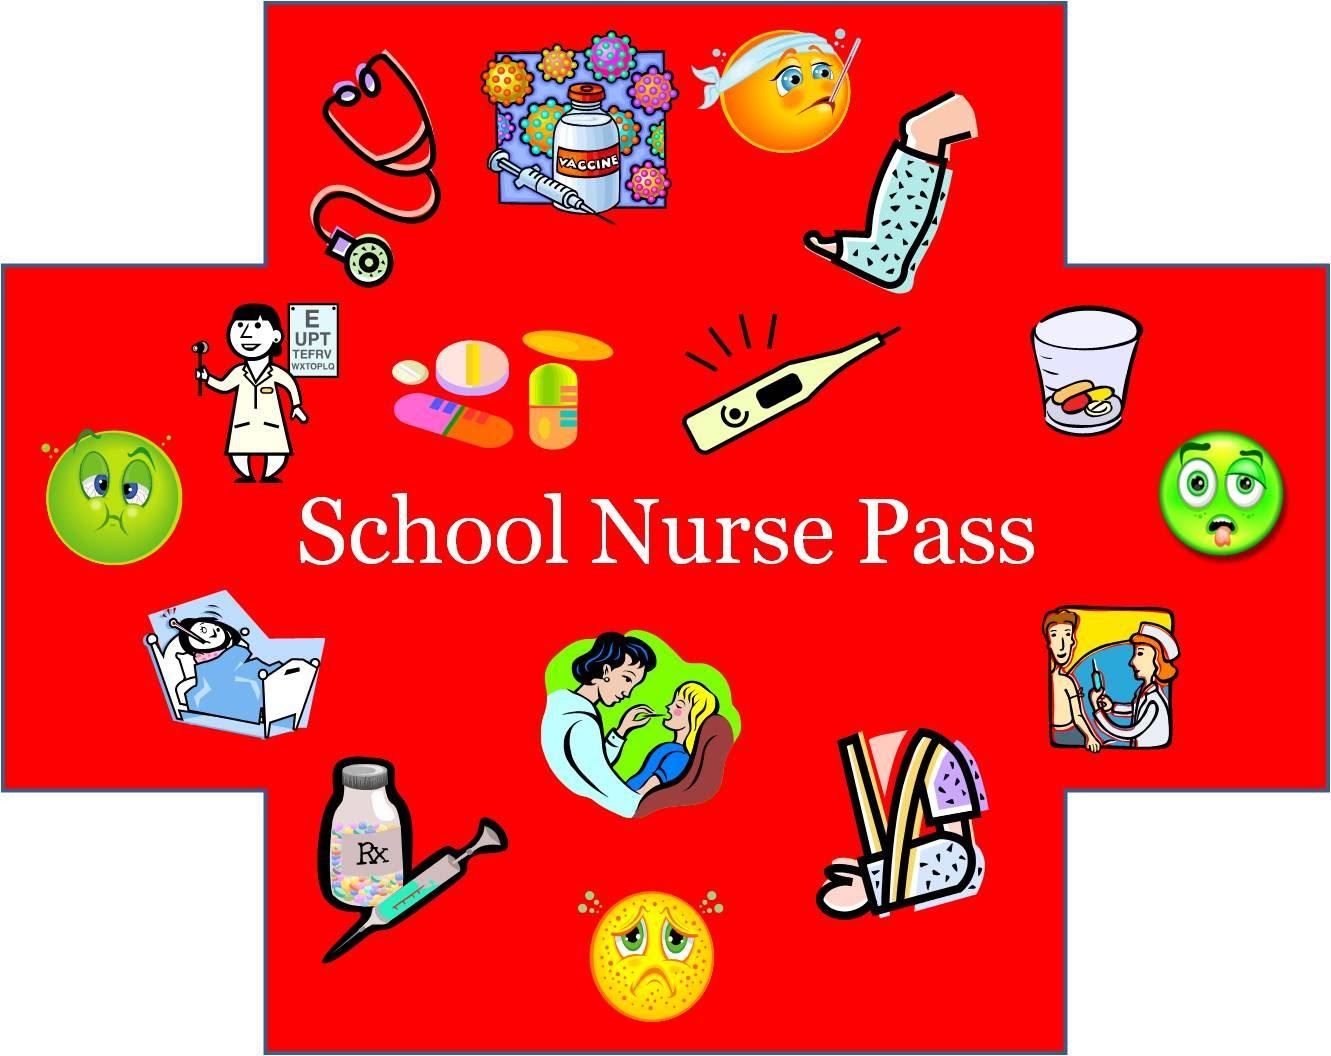 School nurse due clipart graphic royalty free download Free Cliparts School Nurse, Download Free Clip Art, Free ... graphic royalty free download